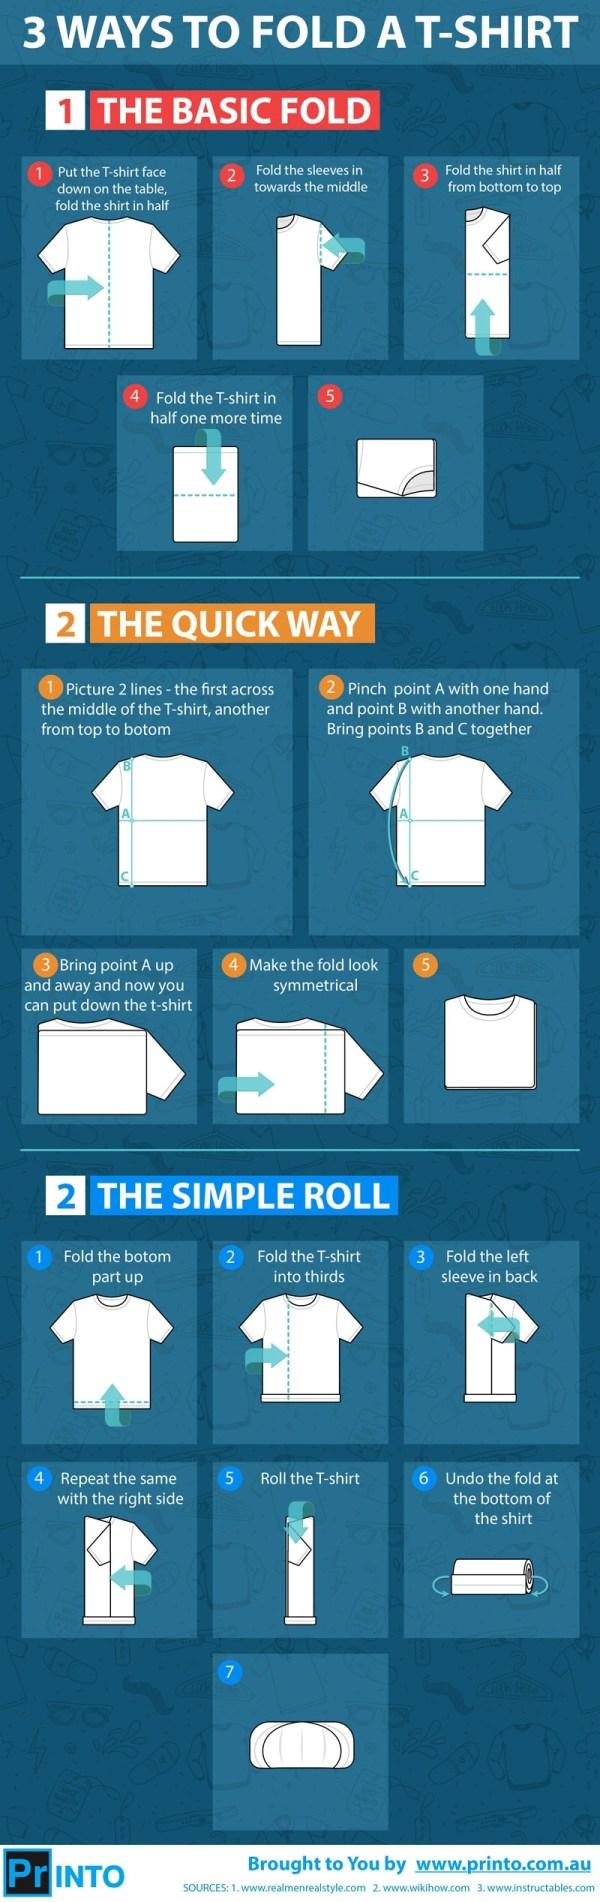 how-ro-fold-tshirt-medium